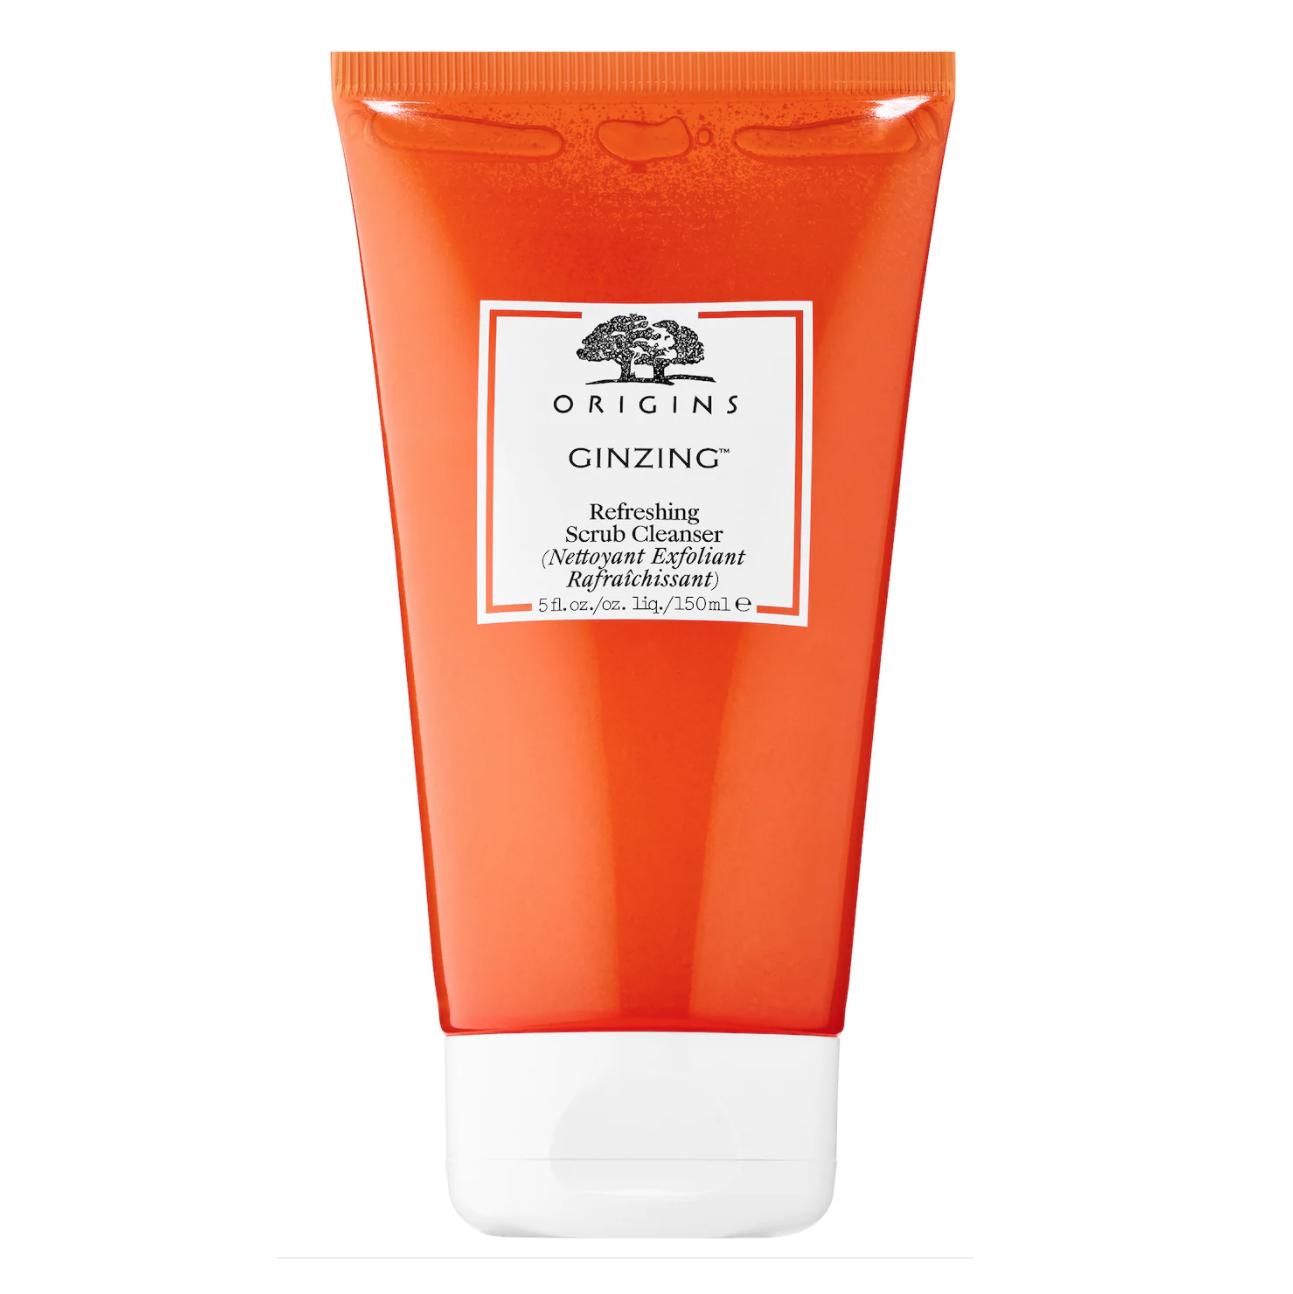 best exfoliating face washes 2021 origins